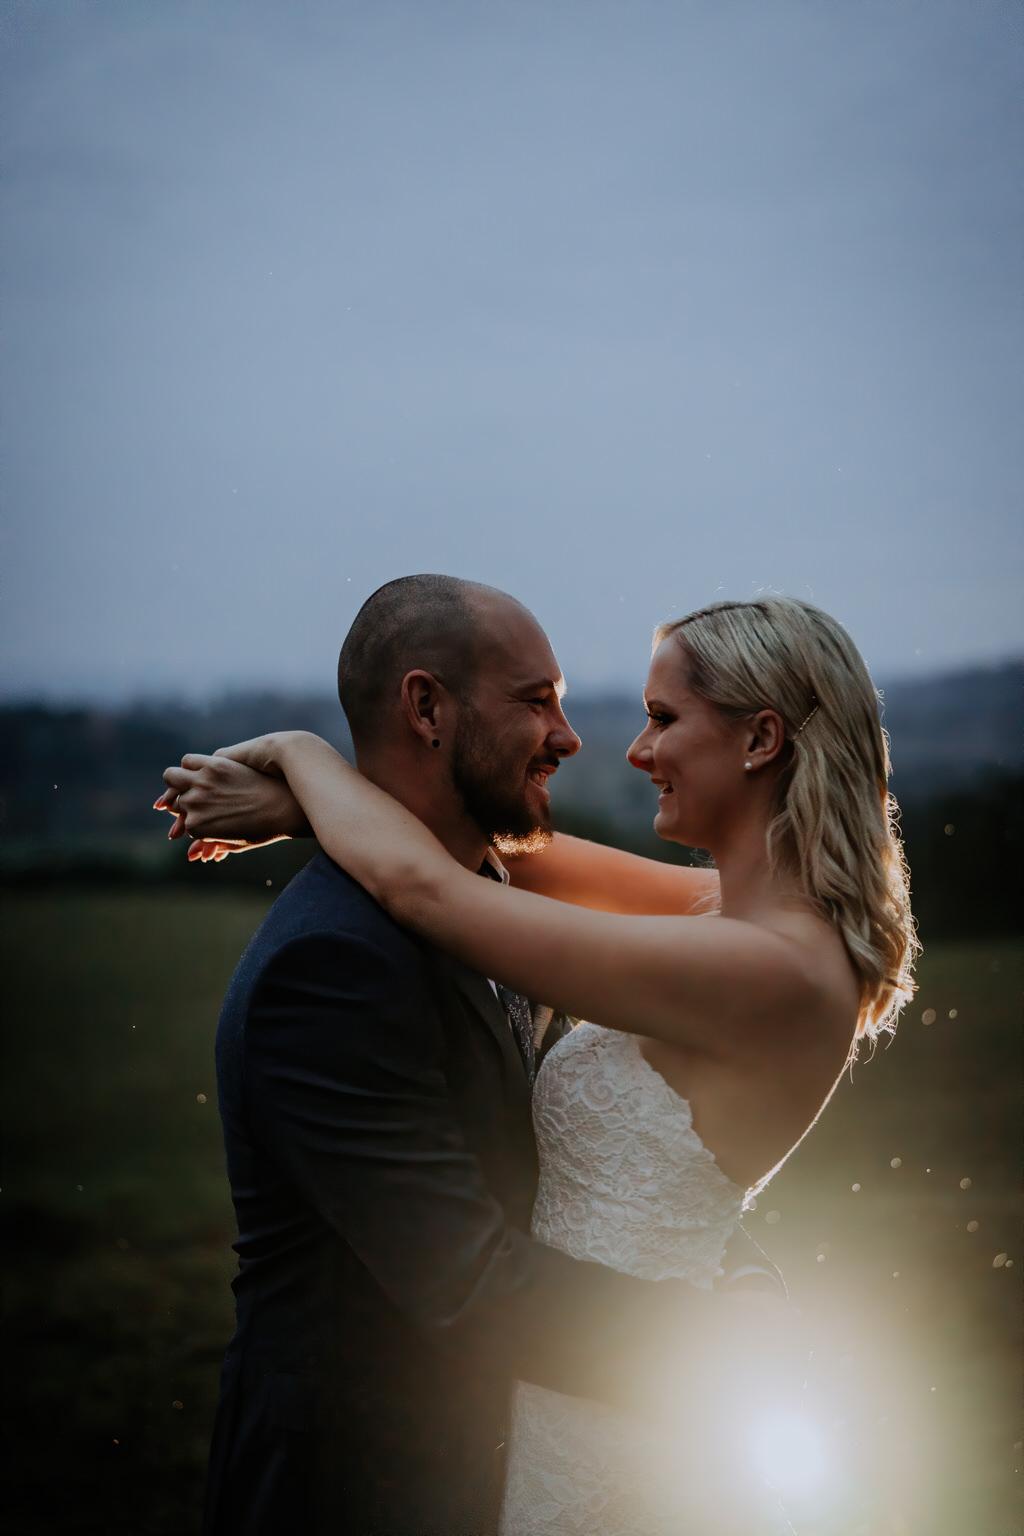 ava-me-photography-jade-simon-loxley-bellbird-hill-kurrajong-heights-wedding-901-1